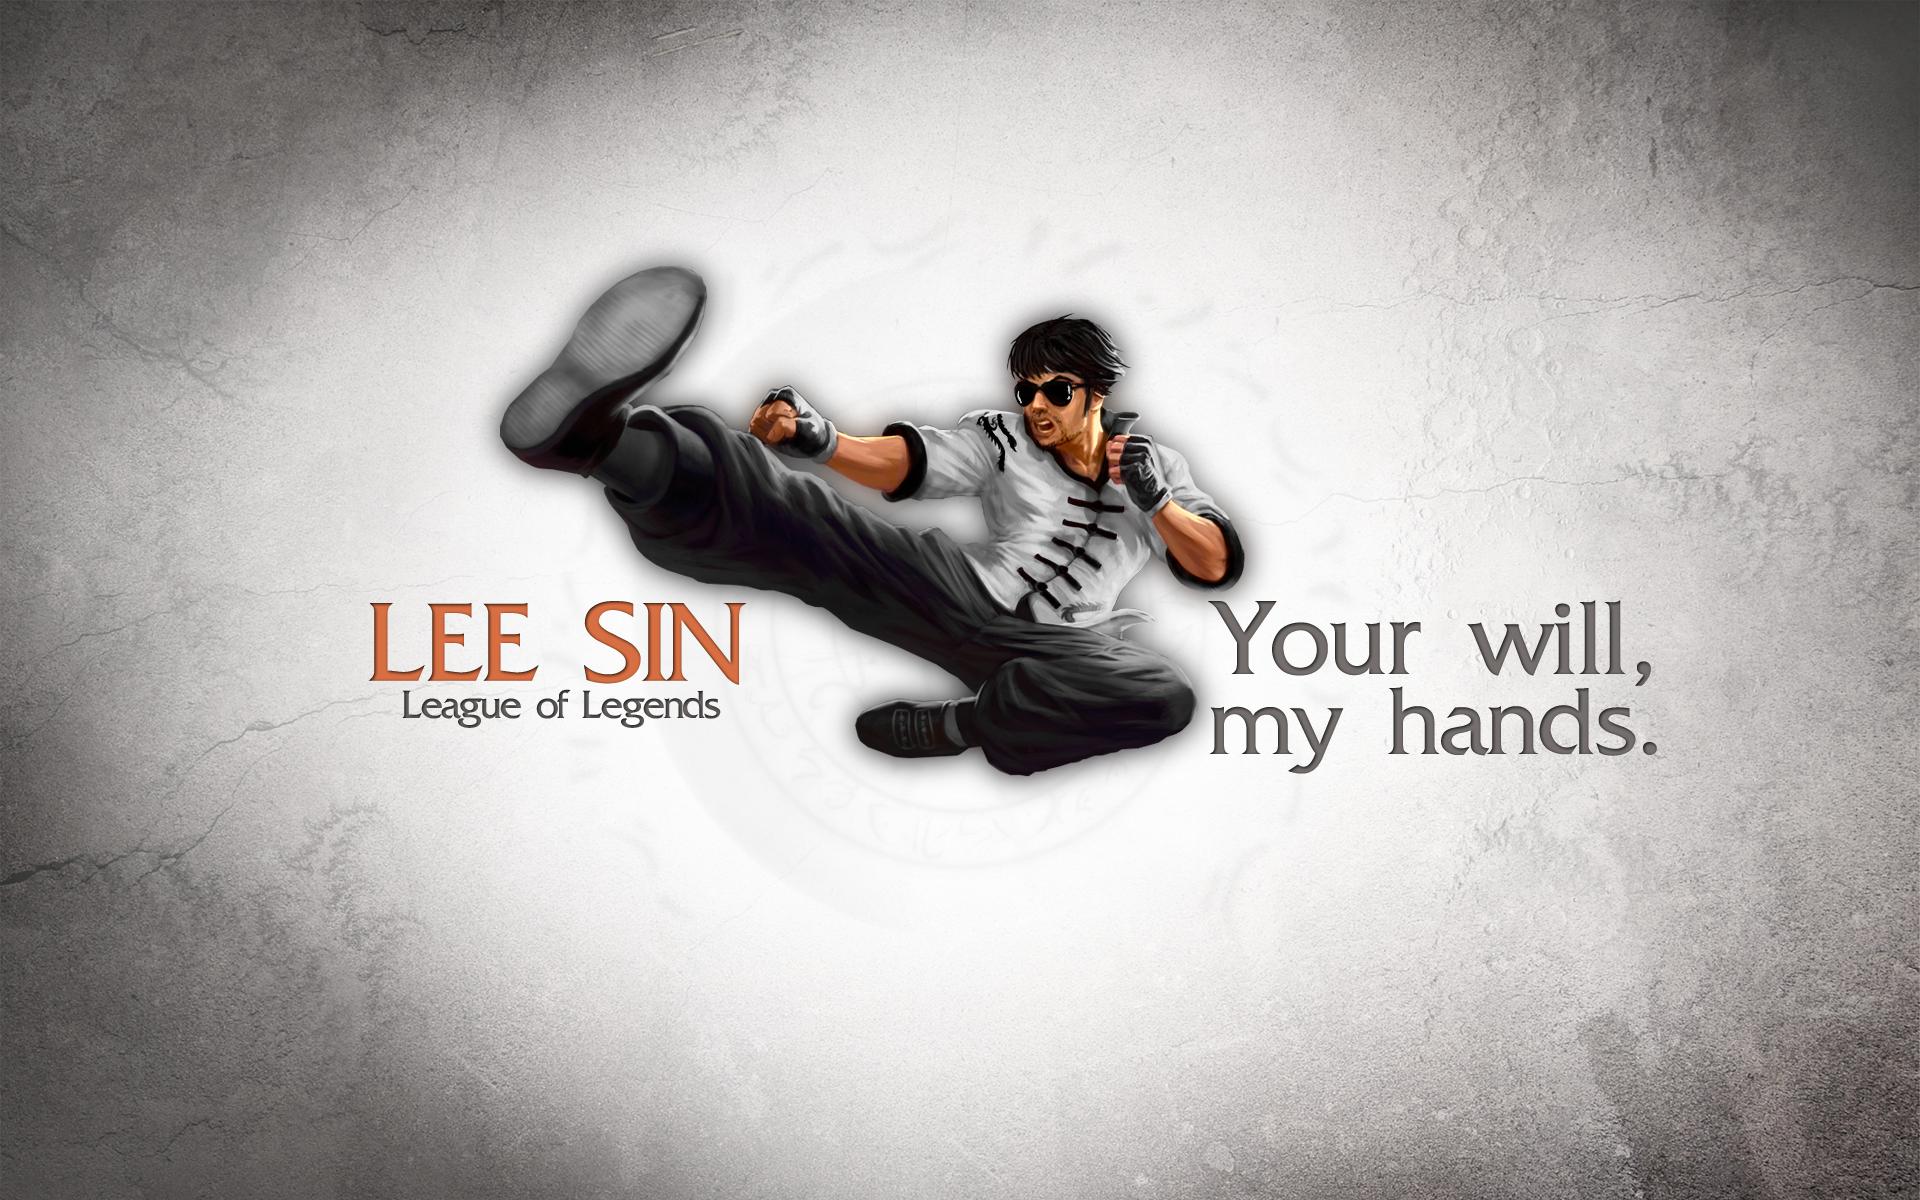 Dragon Fist Lee Sin wallpaper